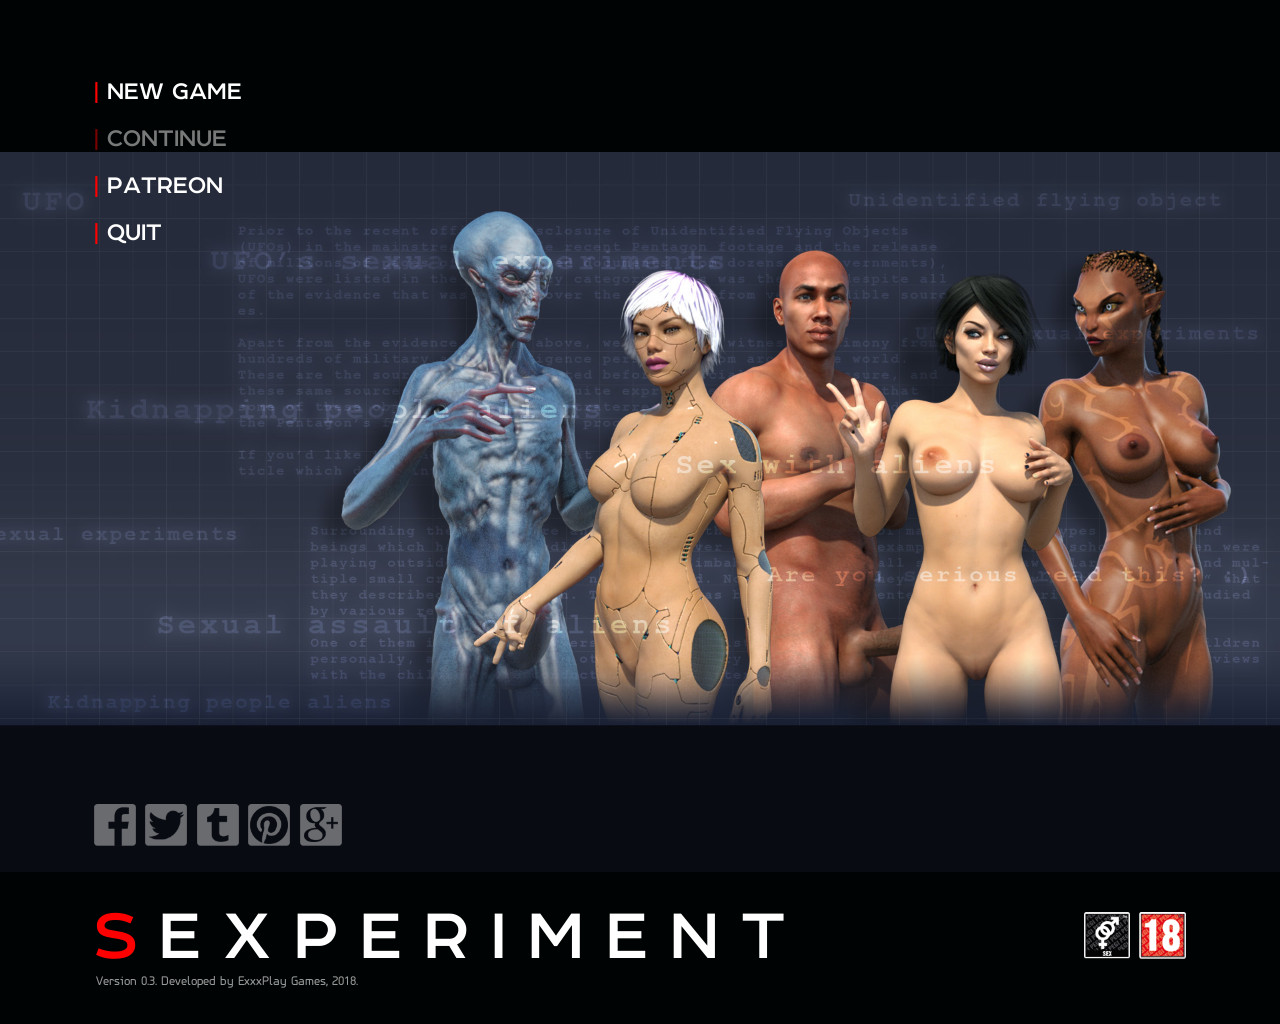 18 Adult Porn Games sexperiment - version 0.3.1 [exxxplay] - best-hentai-games